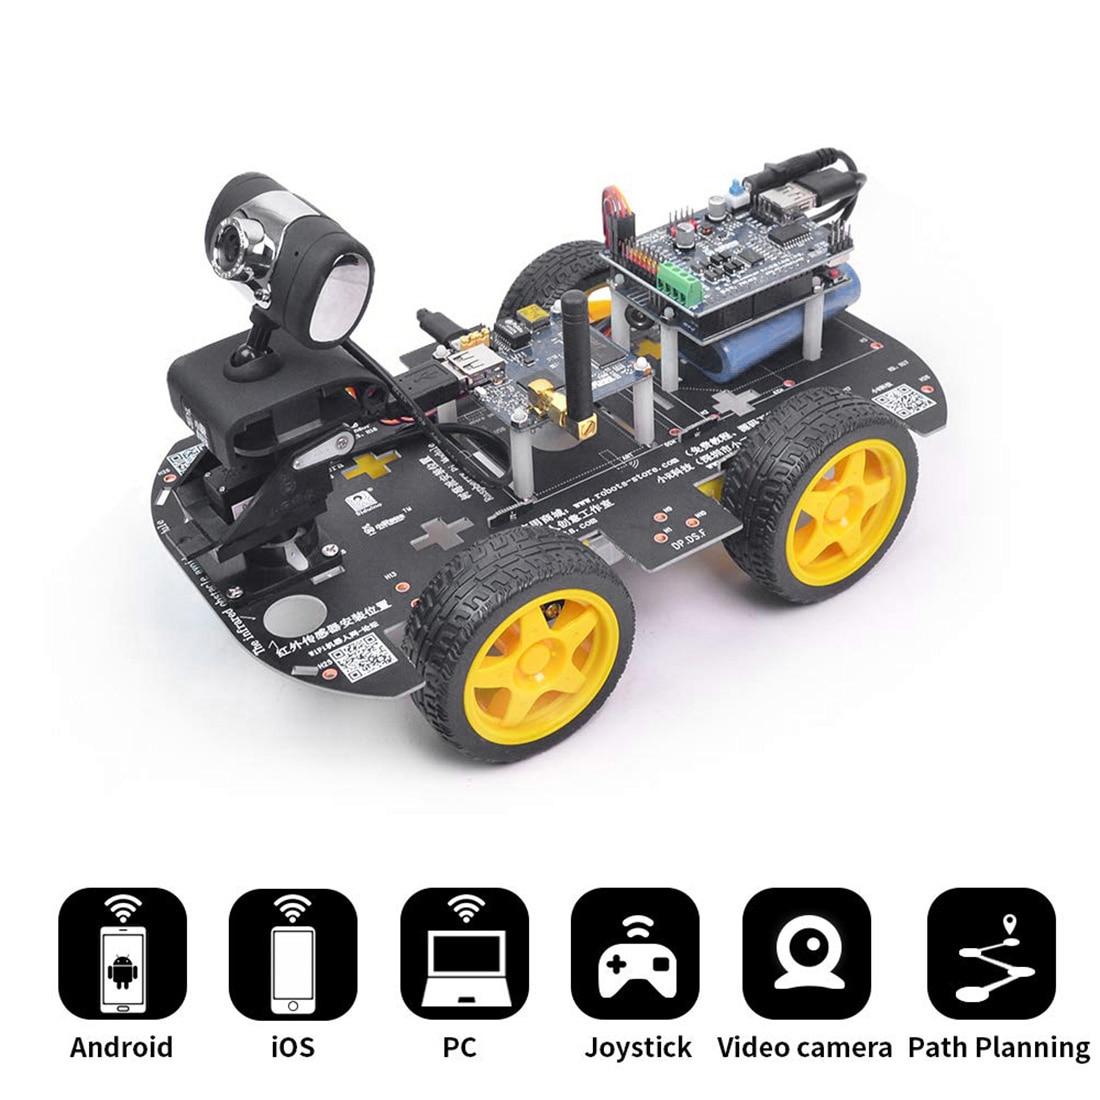 DIY Programmable Robot Car Wifi Steam Educational Programming Car For Raspberry Pi 4 (2G) High Tech Toy-Standard Edition US Plug